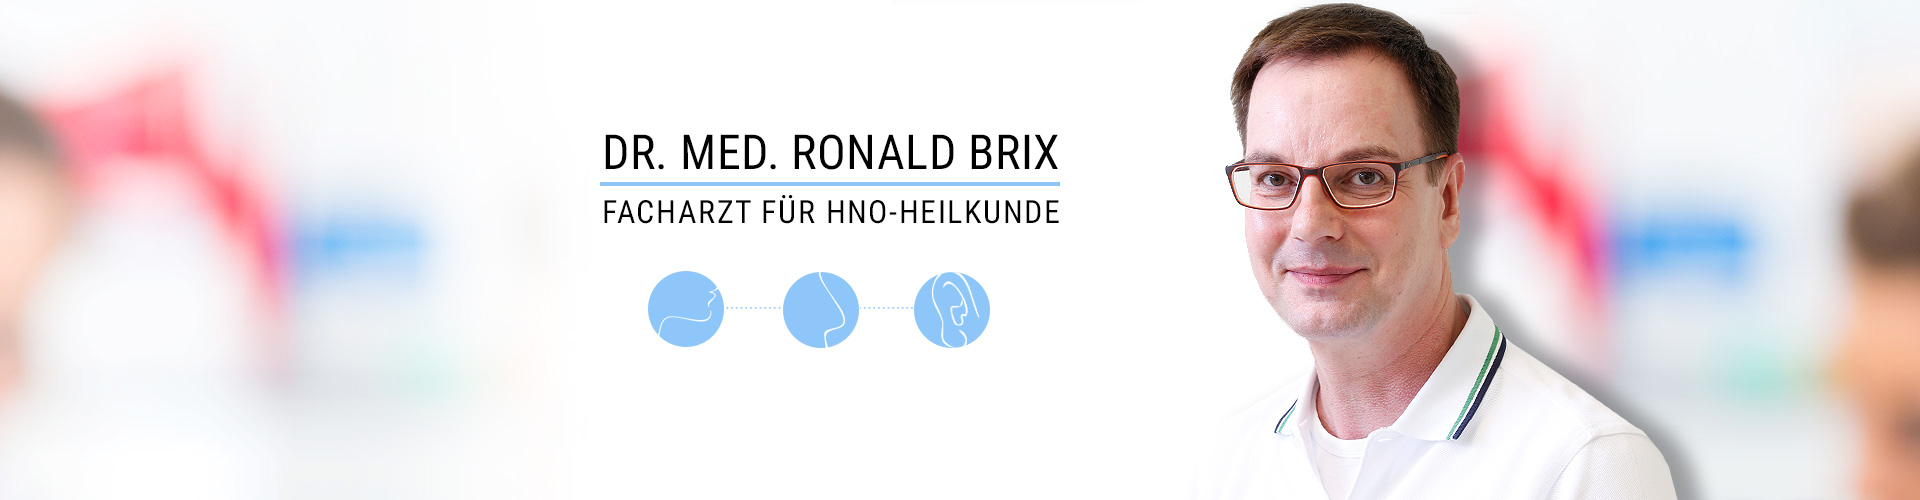 Praxis Dr. med. Ronald Brix